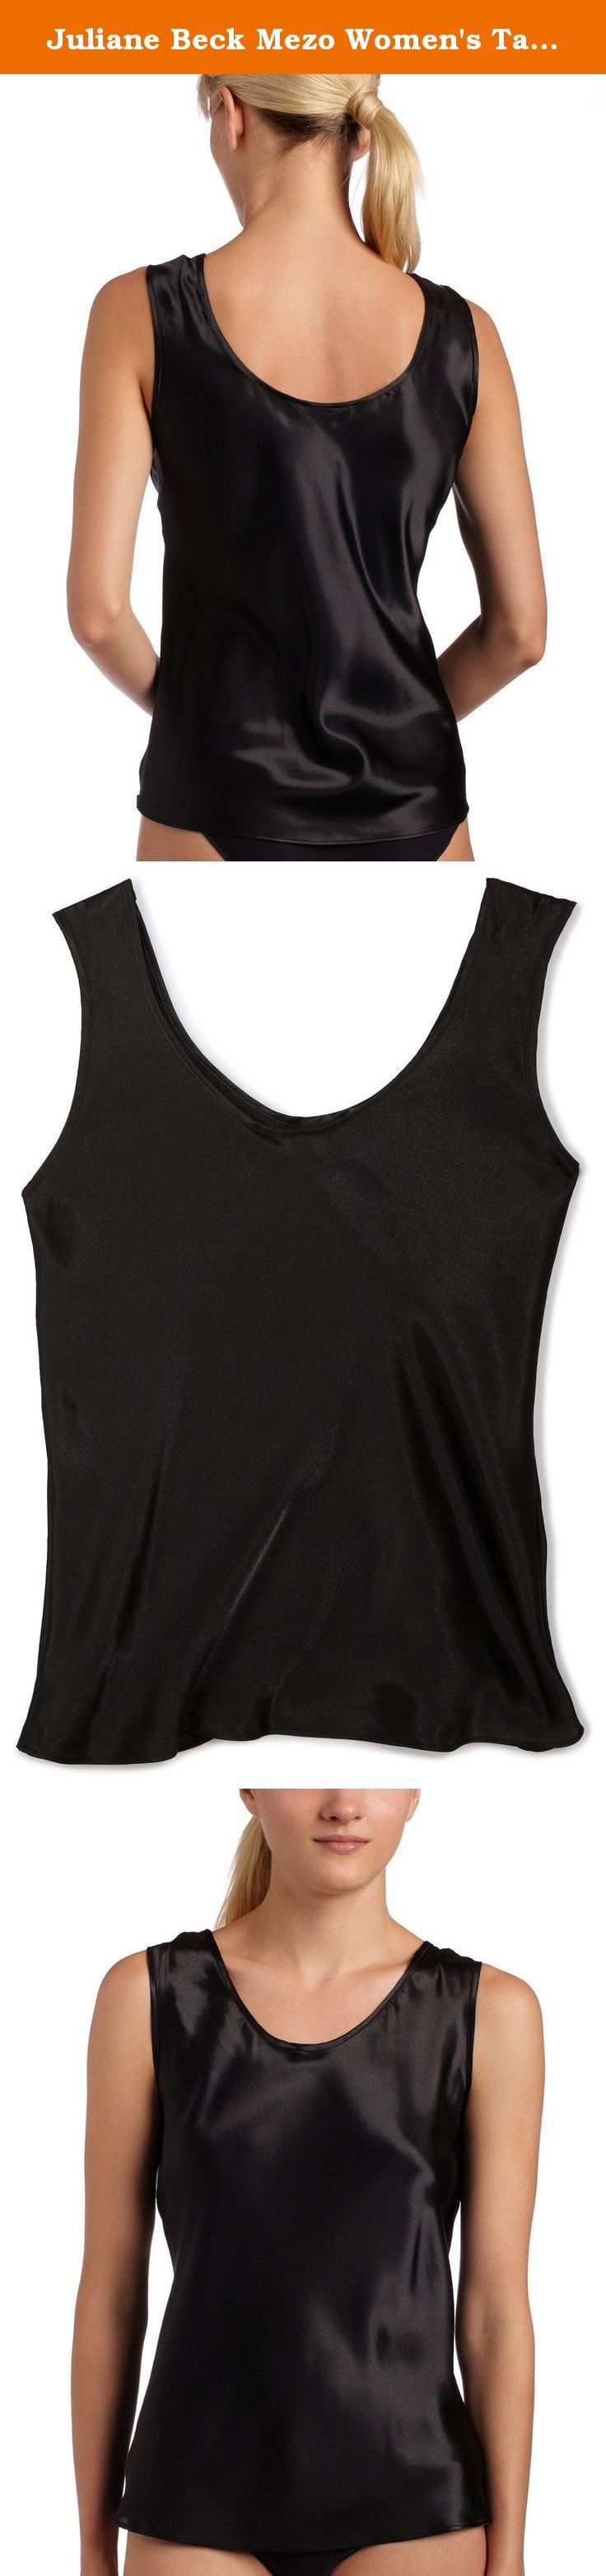 Juliane Beck Mezo Women's Tank Camisole Black X-Large. Juliane Beck Mezo #640051 all satin, round neck, tank strap camisole.